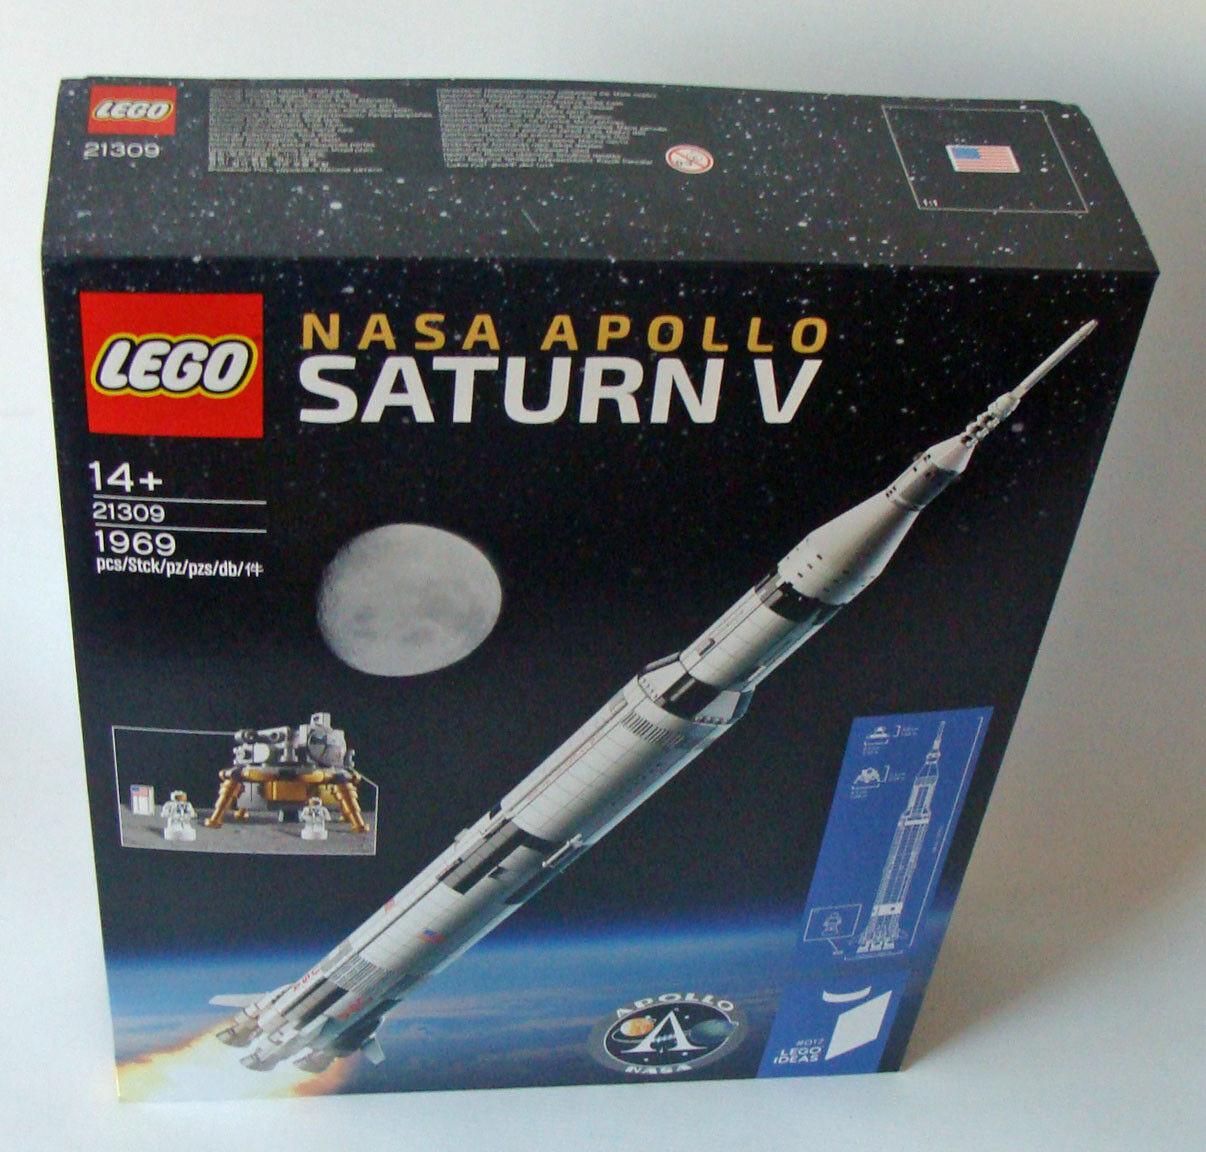 Lego® Ideas 21309 - Nasa Apollo Saturn V 1969 Teile 14+ - Neu